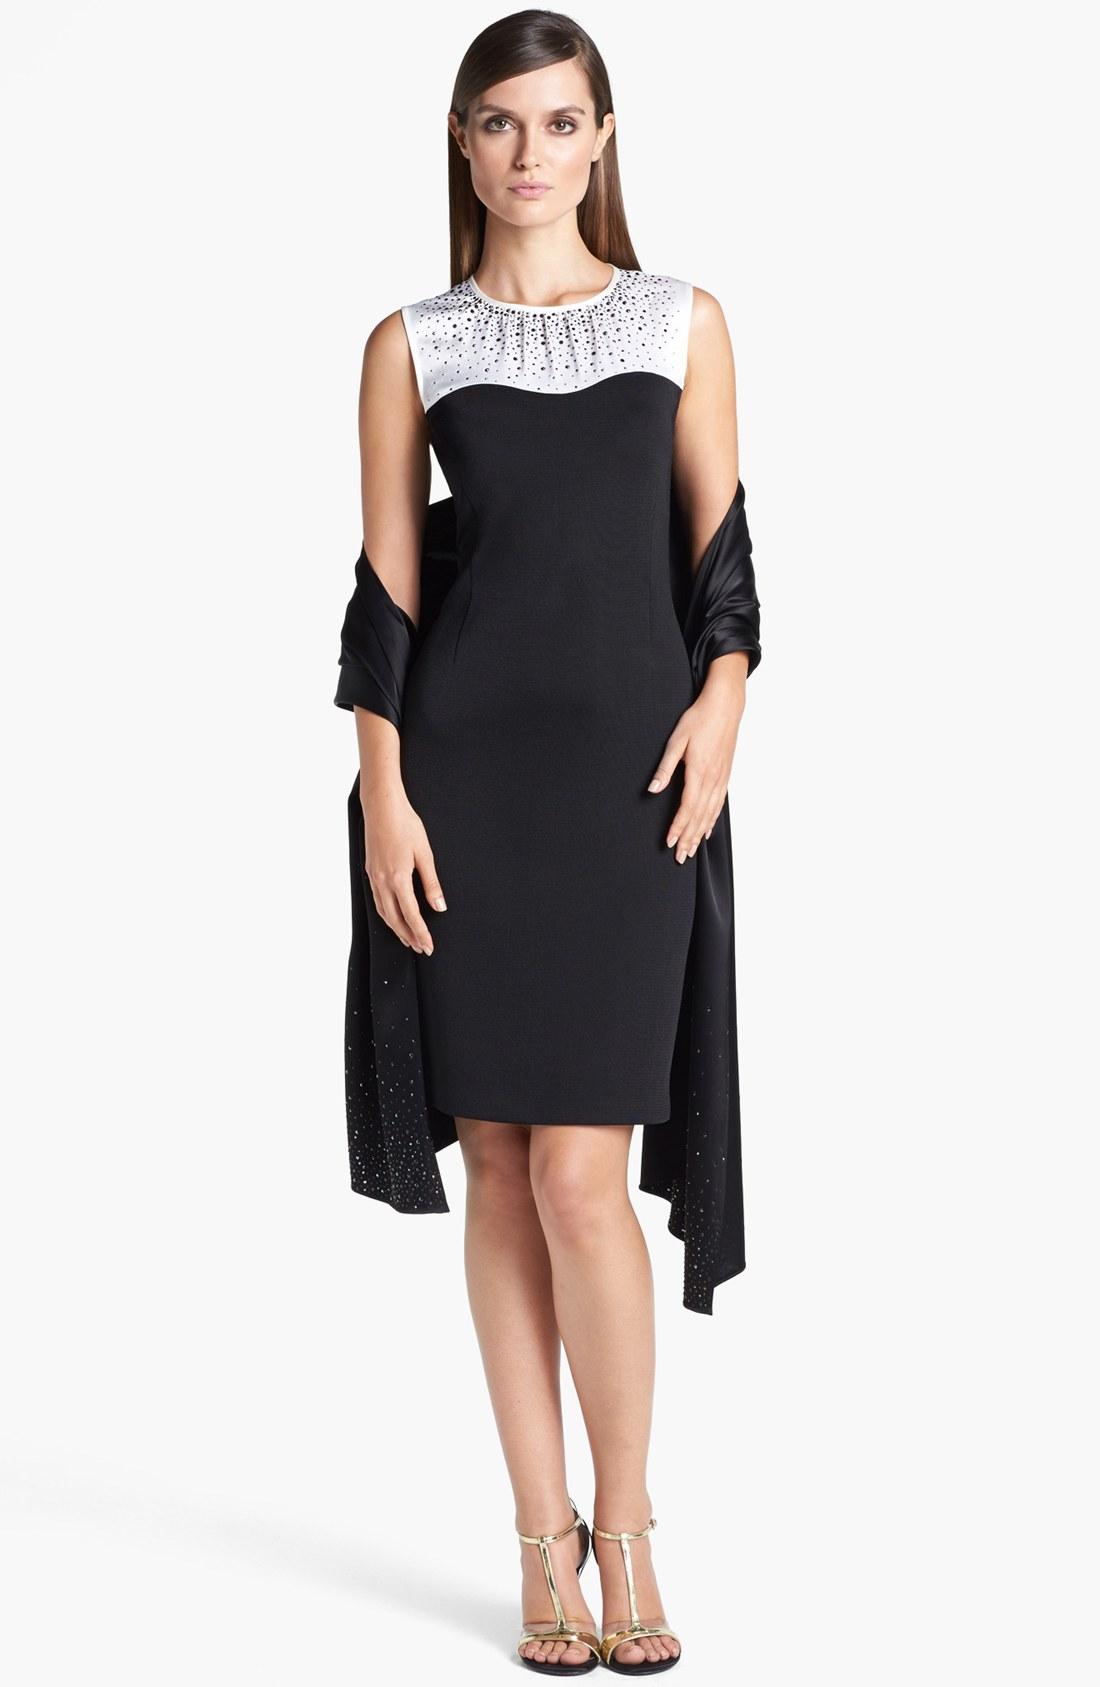 f6e010020a12 Details about St. John Collection Satin Yoke Milano Knit Sheath Dress (  Size 6)